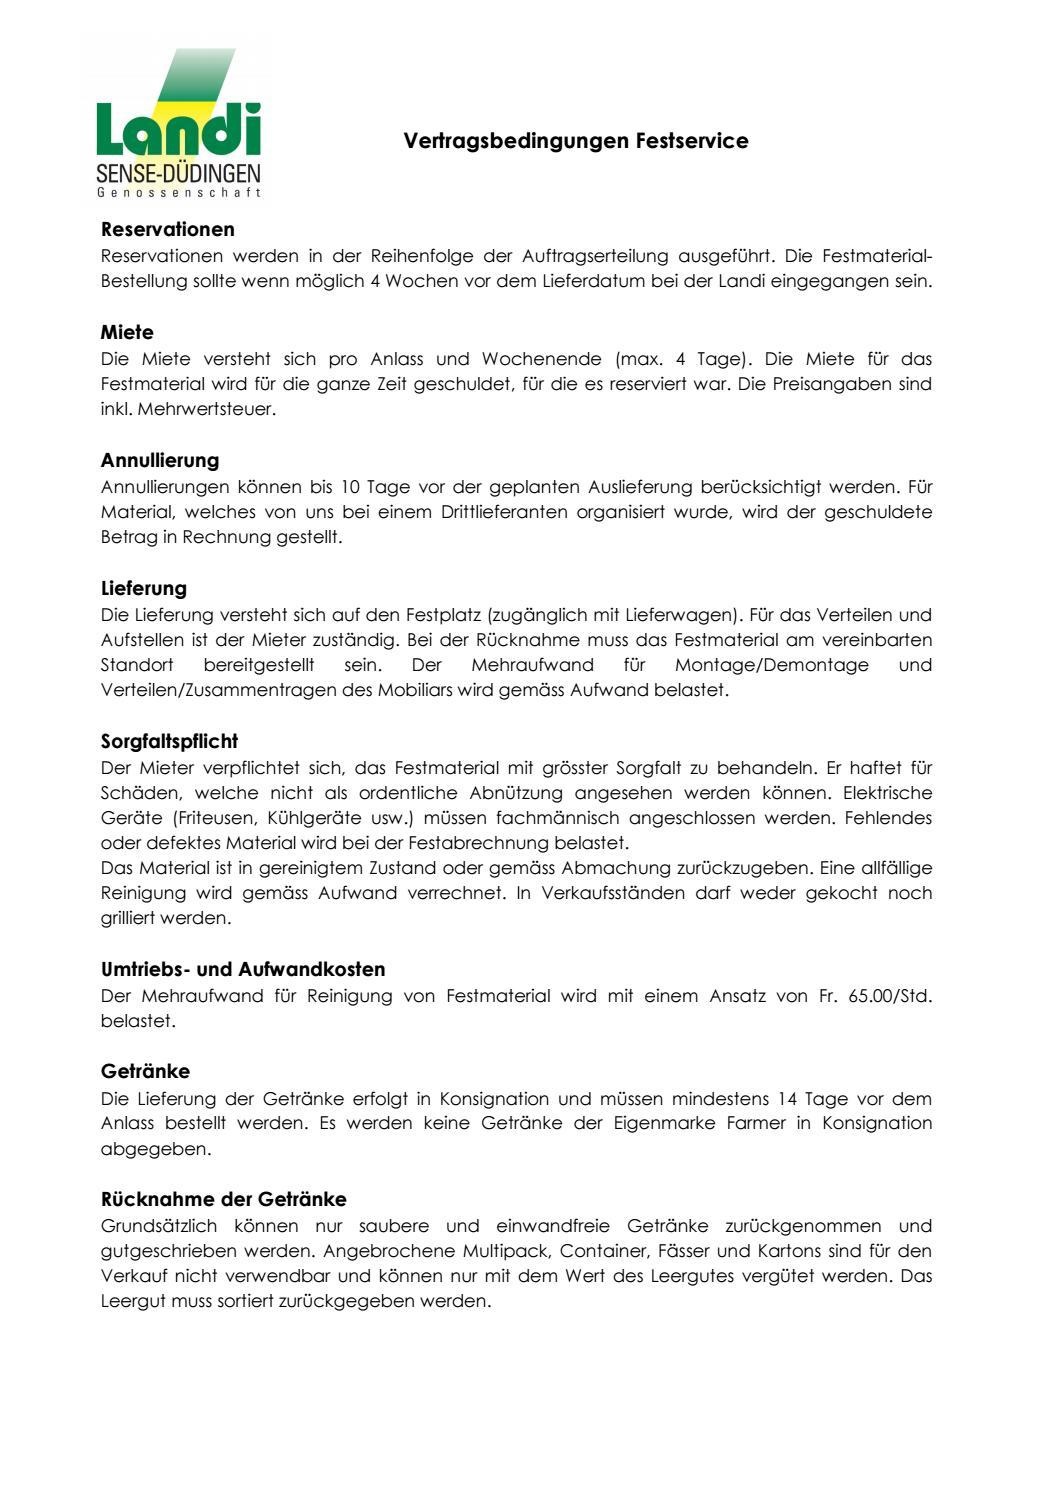 Festmaterial Landi Sense-Düdingen by LANDI - issuu